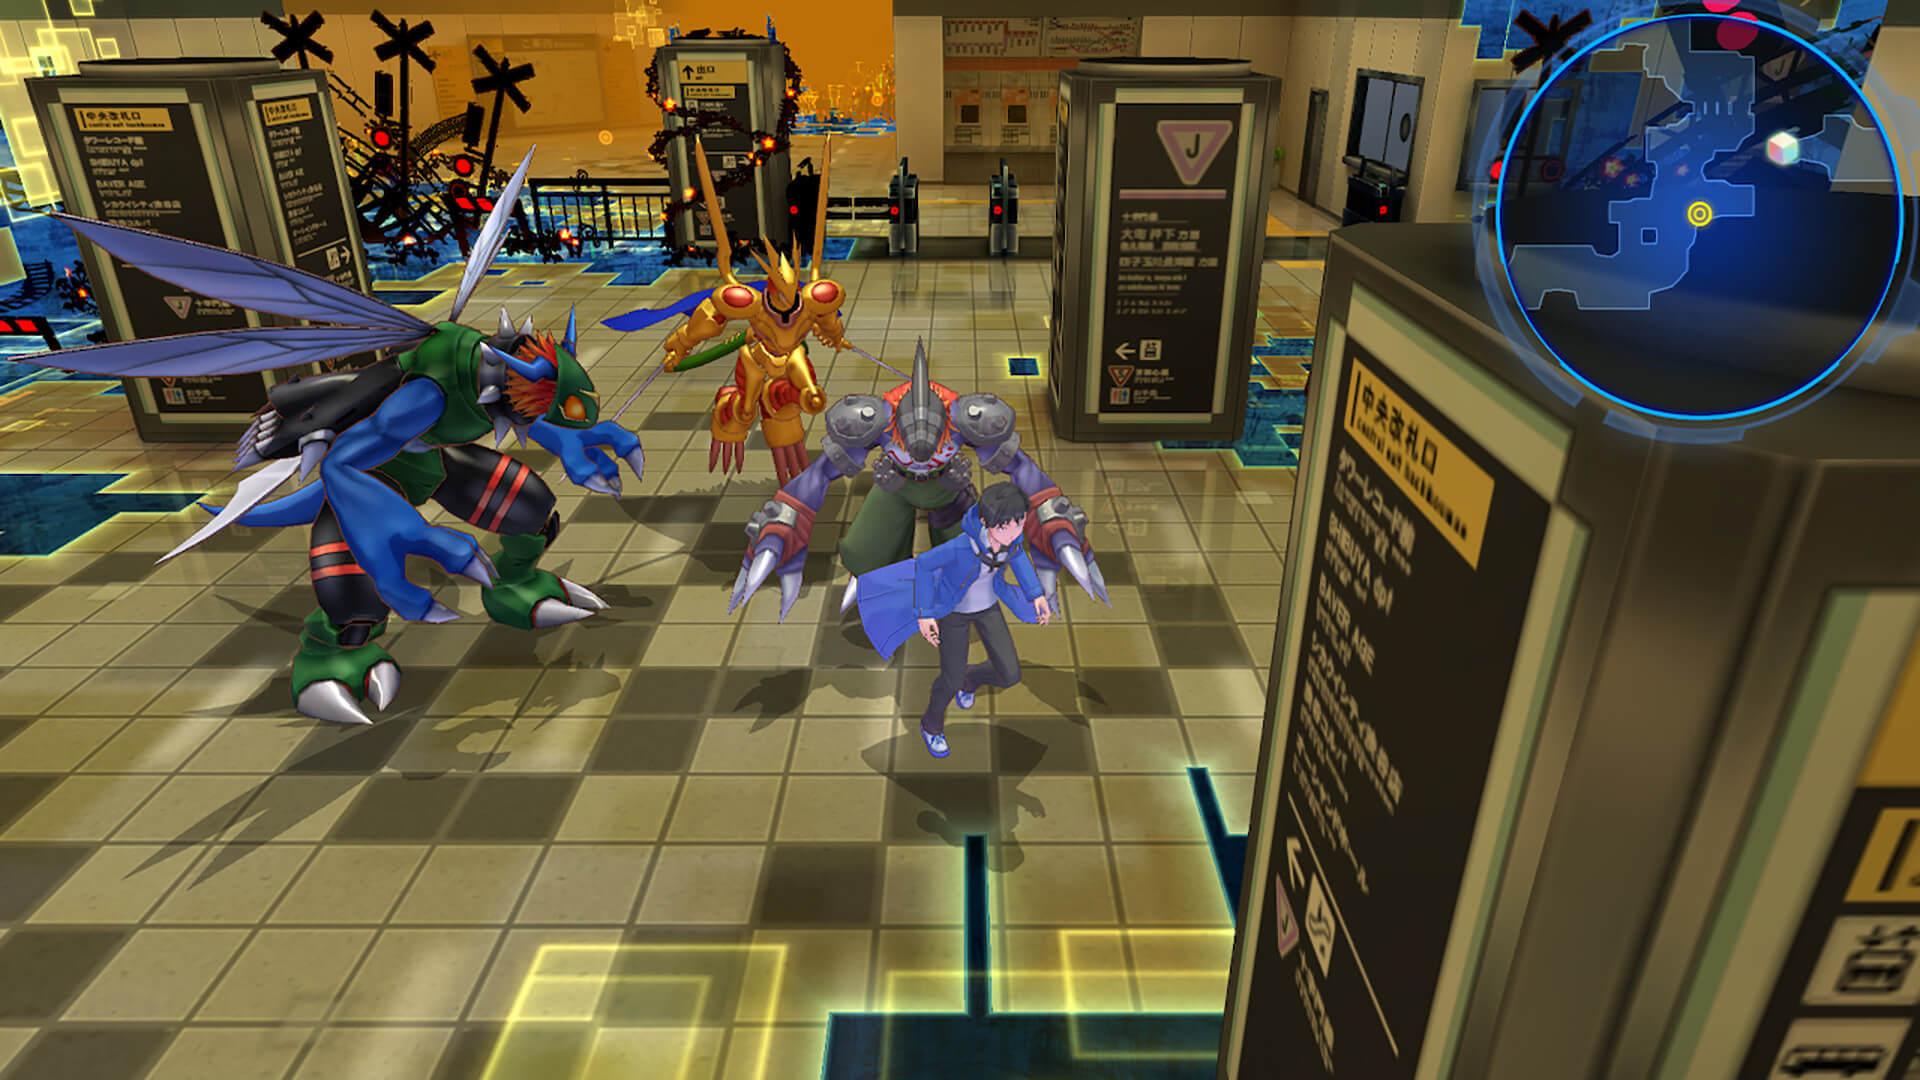 Скриншот из игры Digimon Story Cyber Sleuth